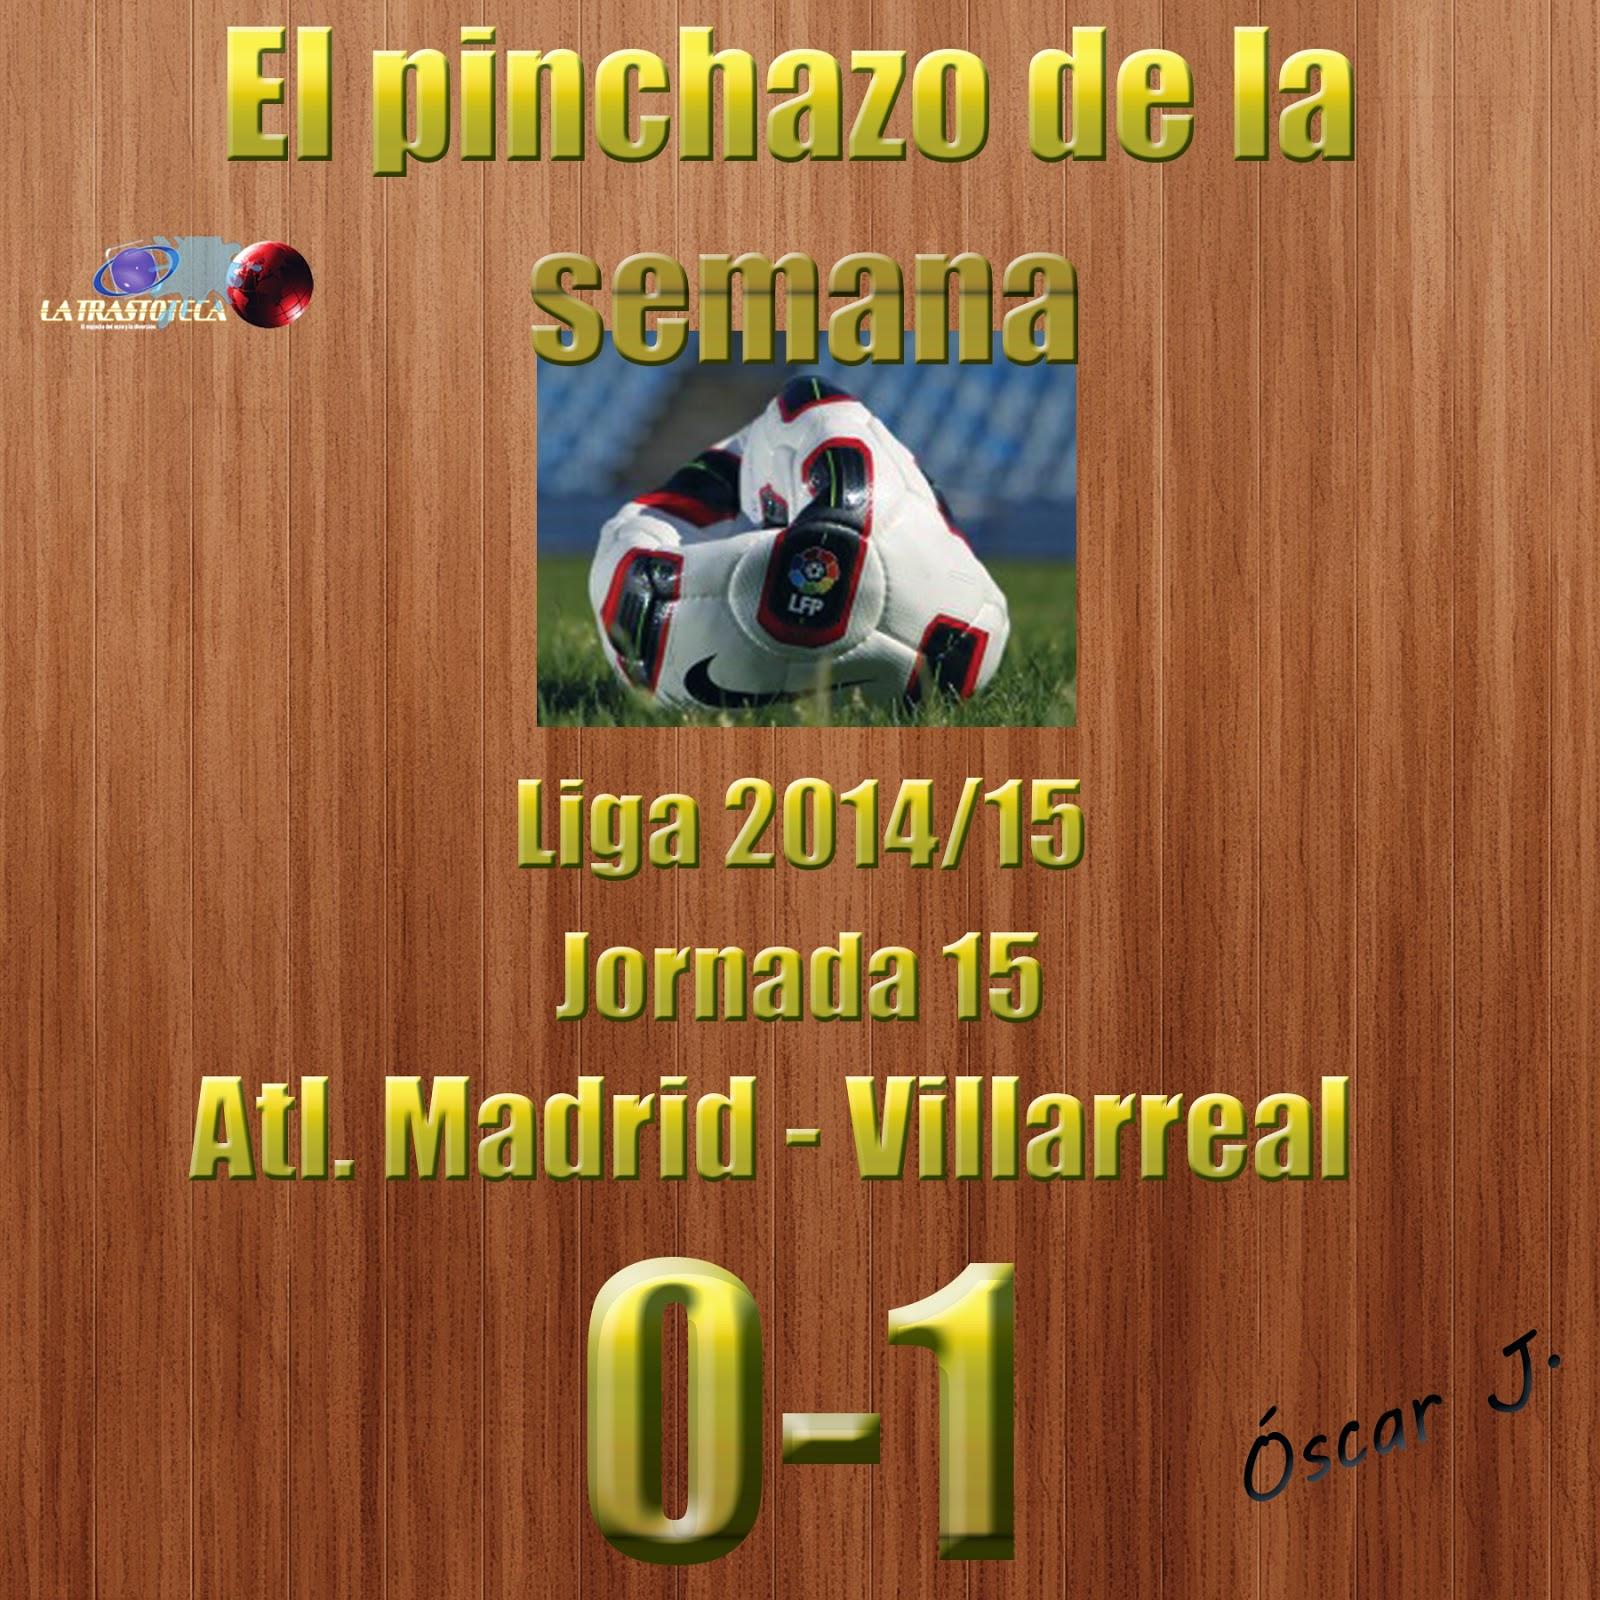 Atlético de Madrid 0-1 Villarreal. Liga 2014/15 - Jornada 15. El pinchazo de la semana.